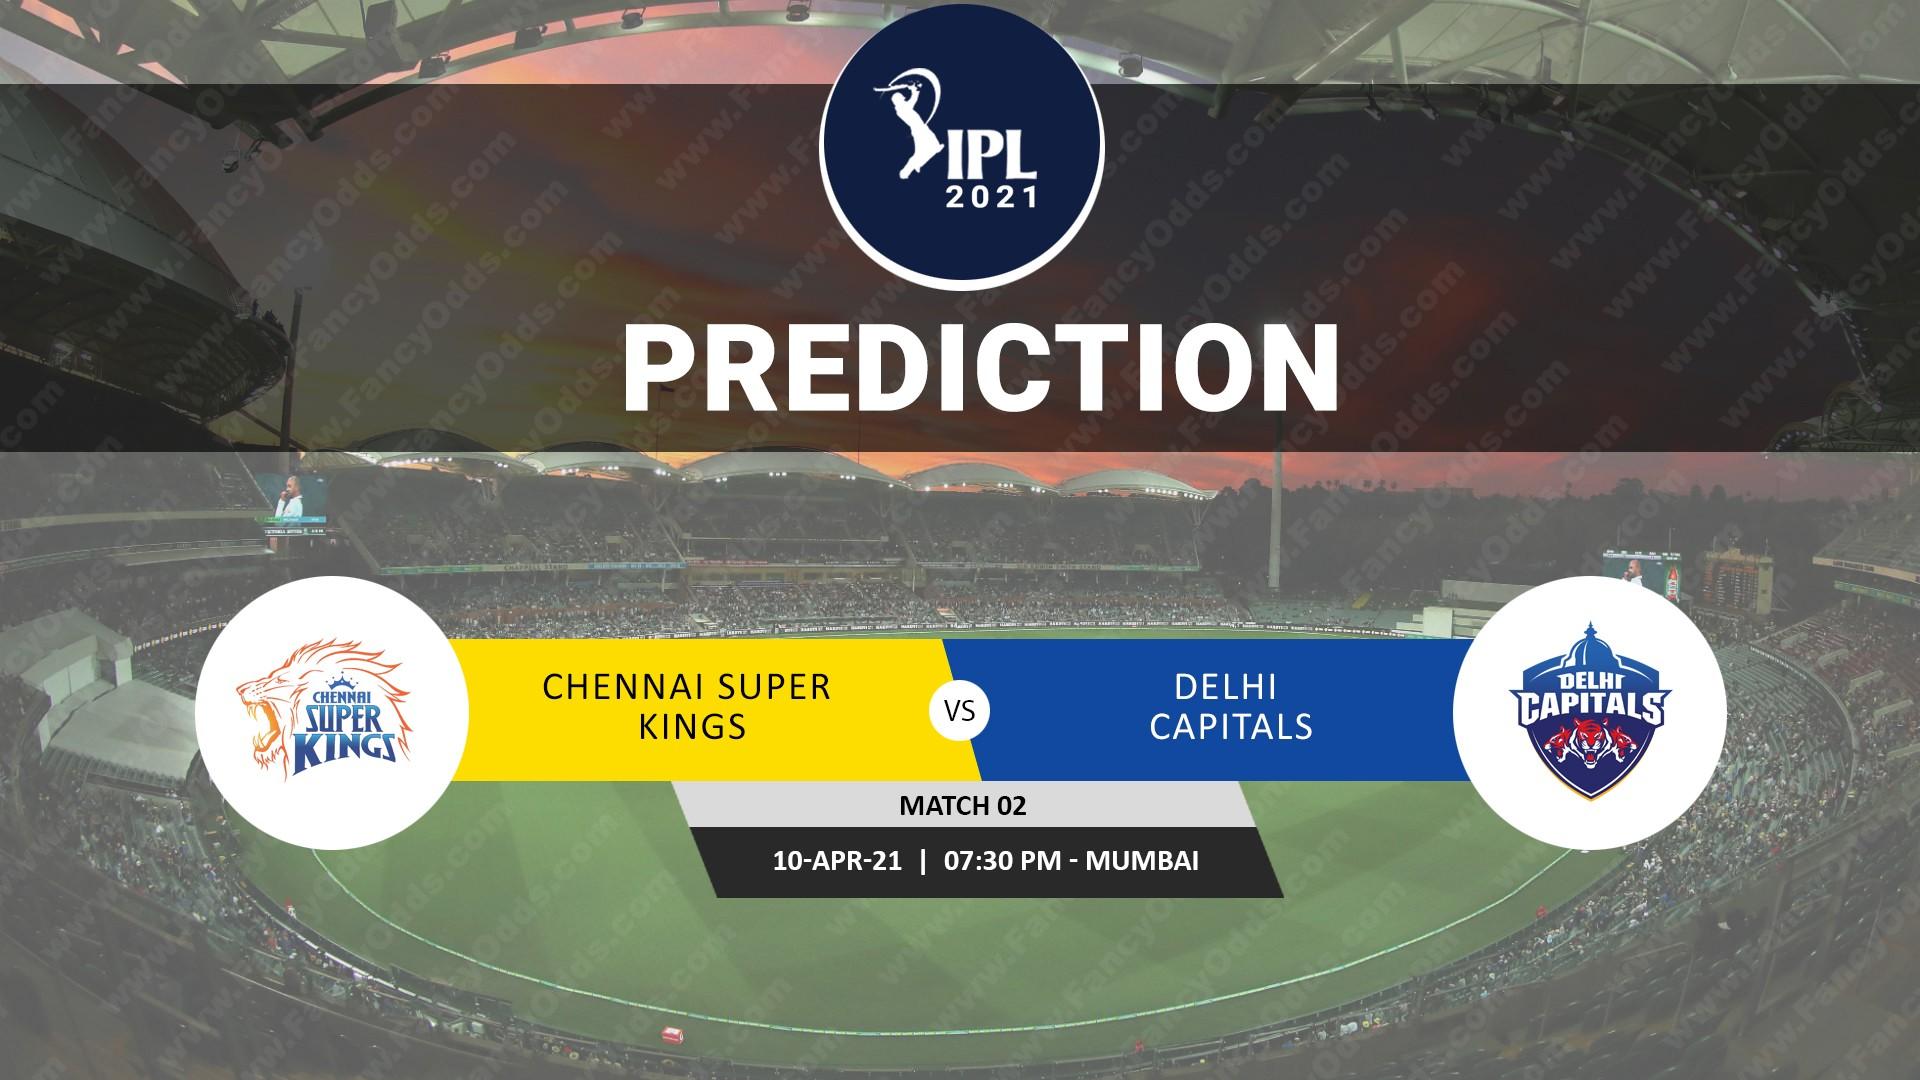 Vivo IPL 2021 CSK Vs DC Match Prediction | Who will win the Chennai Super Kings Vs Delhi Capitals T20 Match Prediction